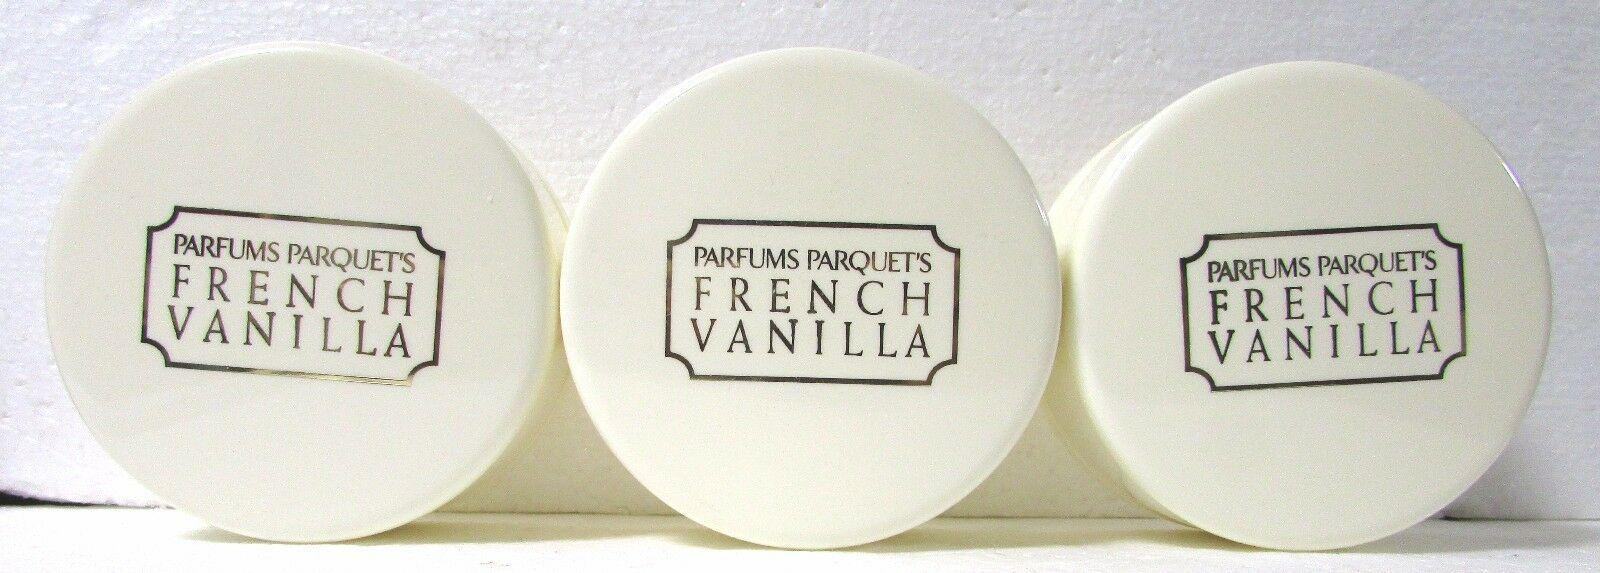 French Vanilla By Dana 1.75oz/49g Dusting Powder For Women (No Box) (Pack Of 3) - $27.61